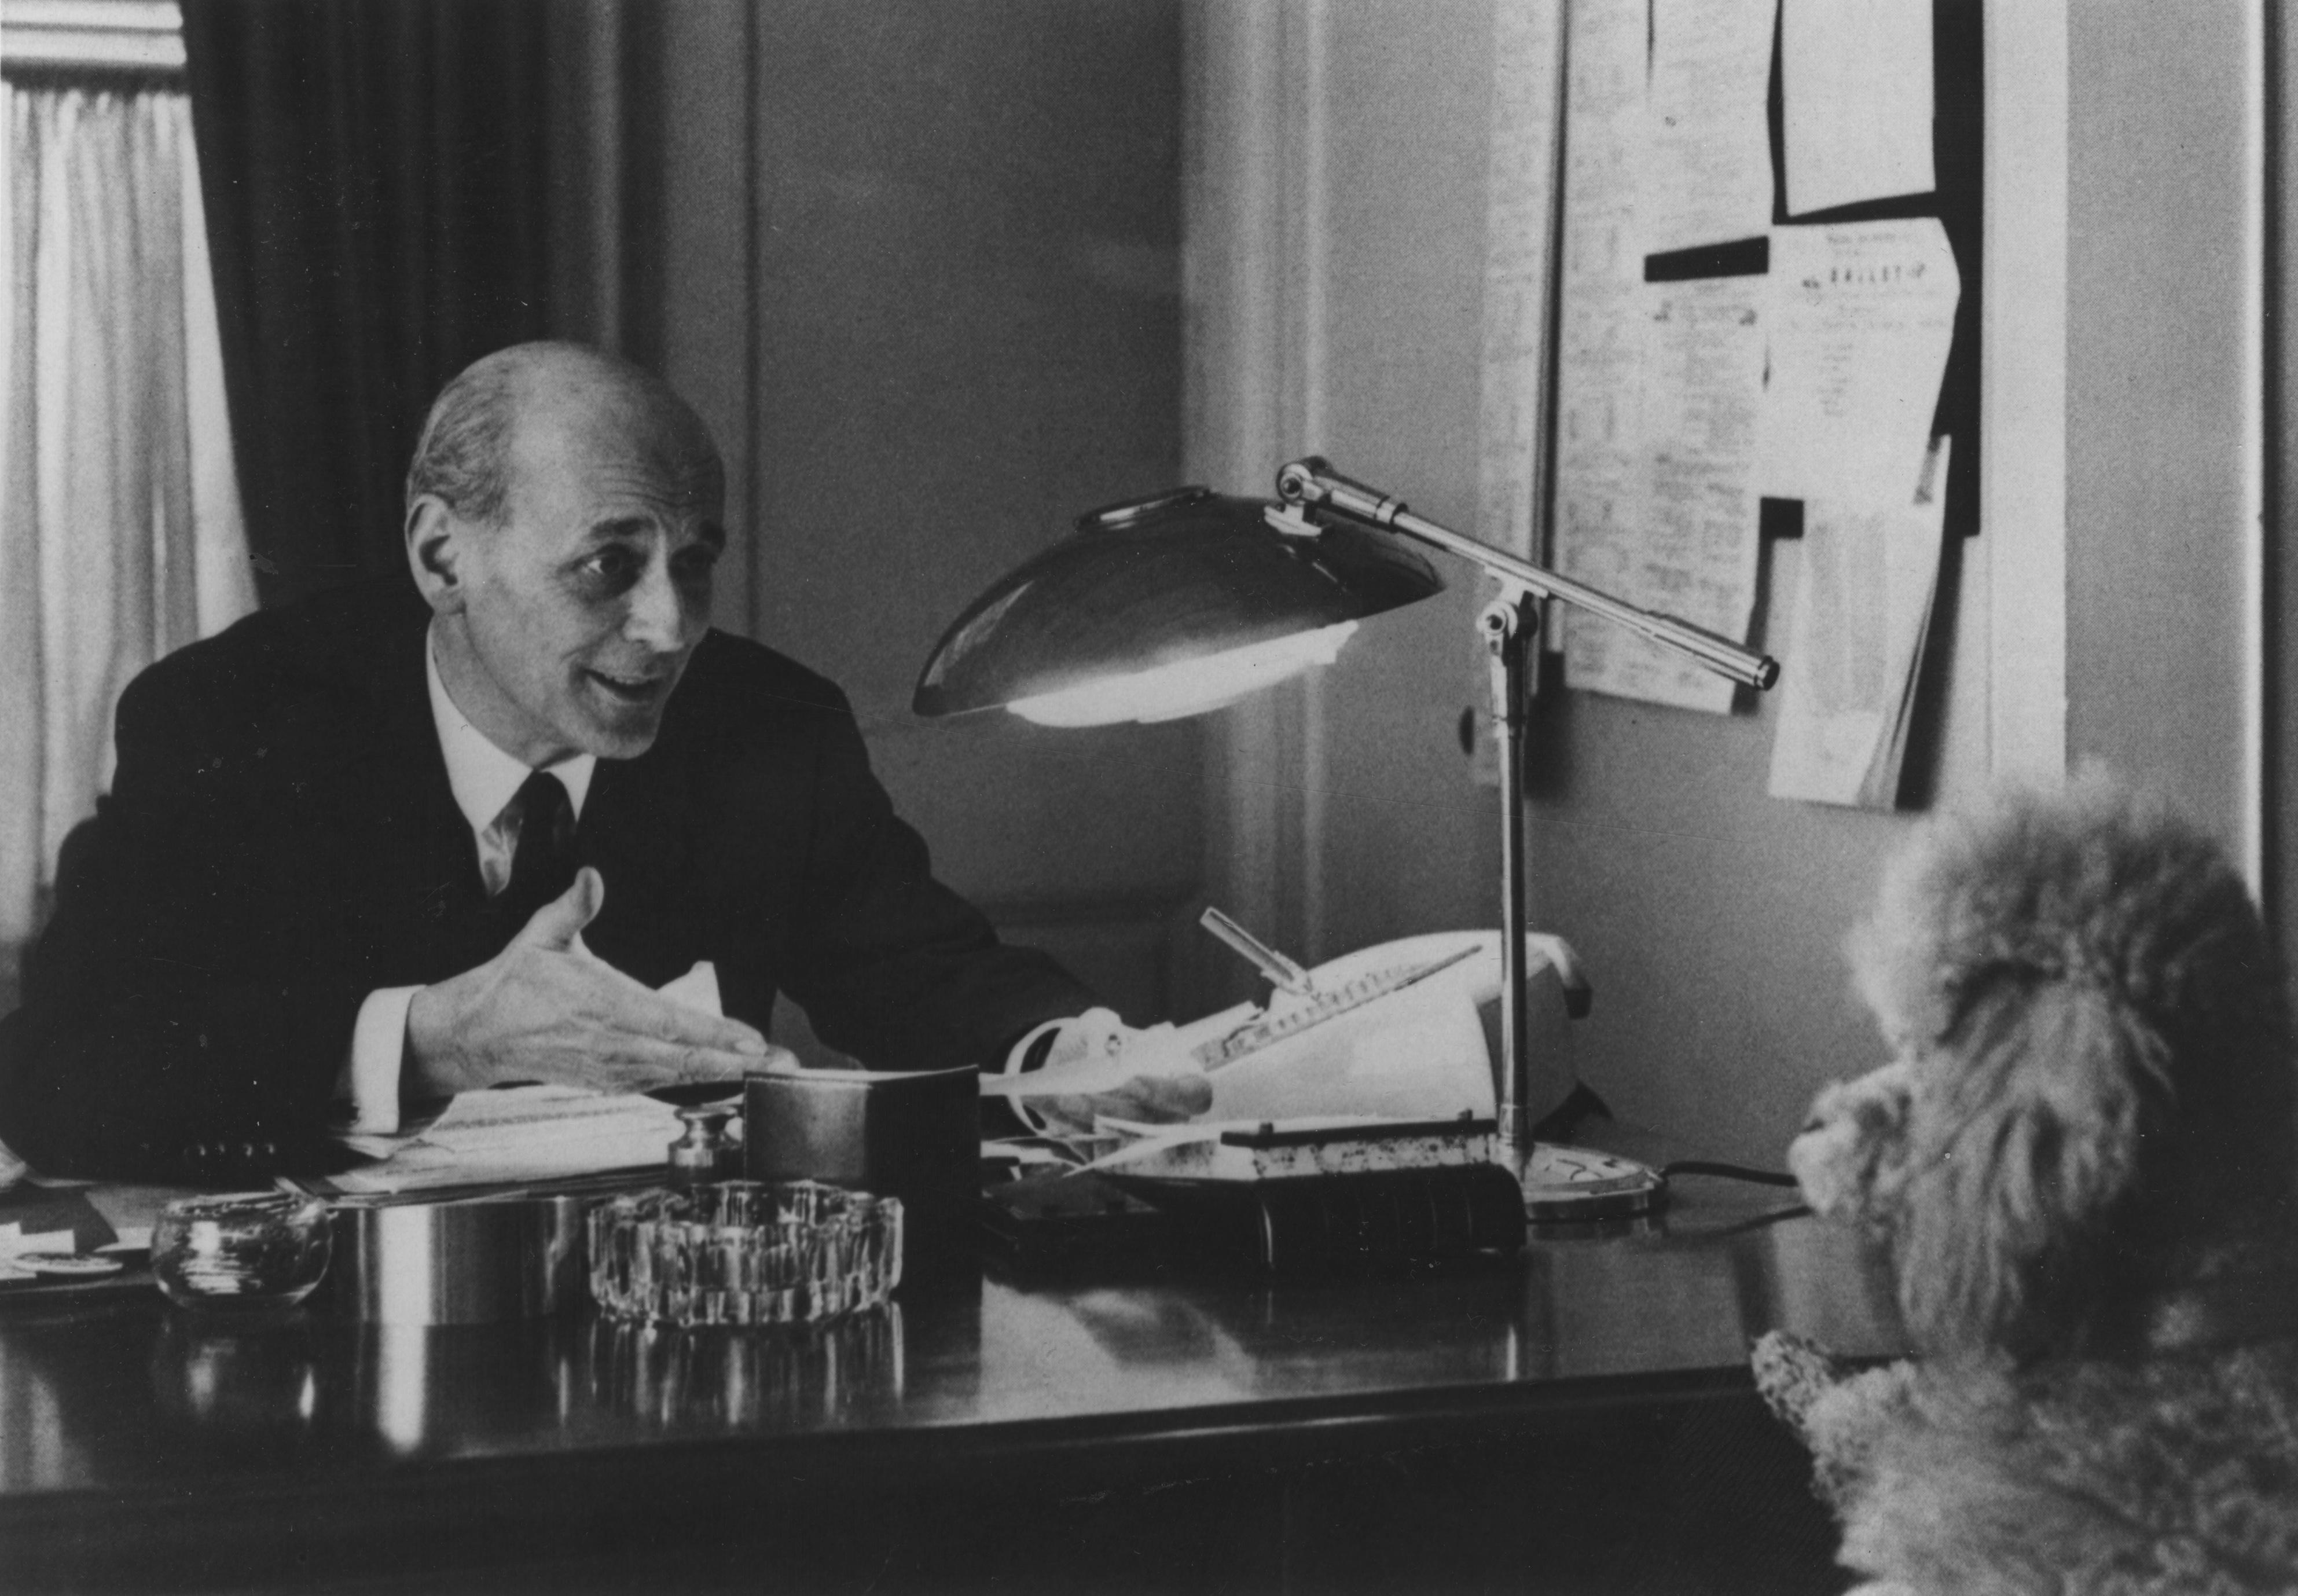 Rudolf Bing with Tebaldi's Poodle